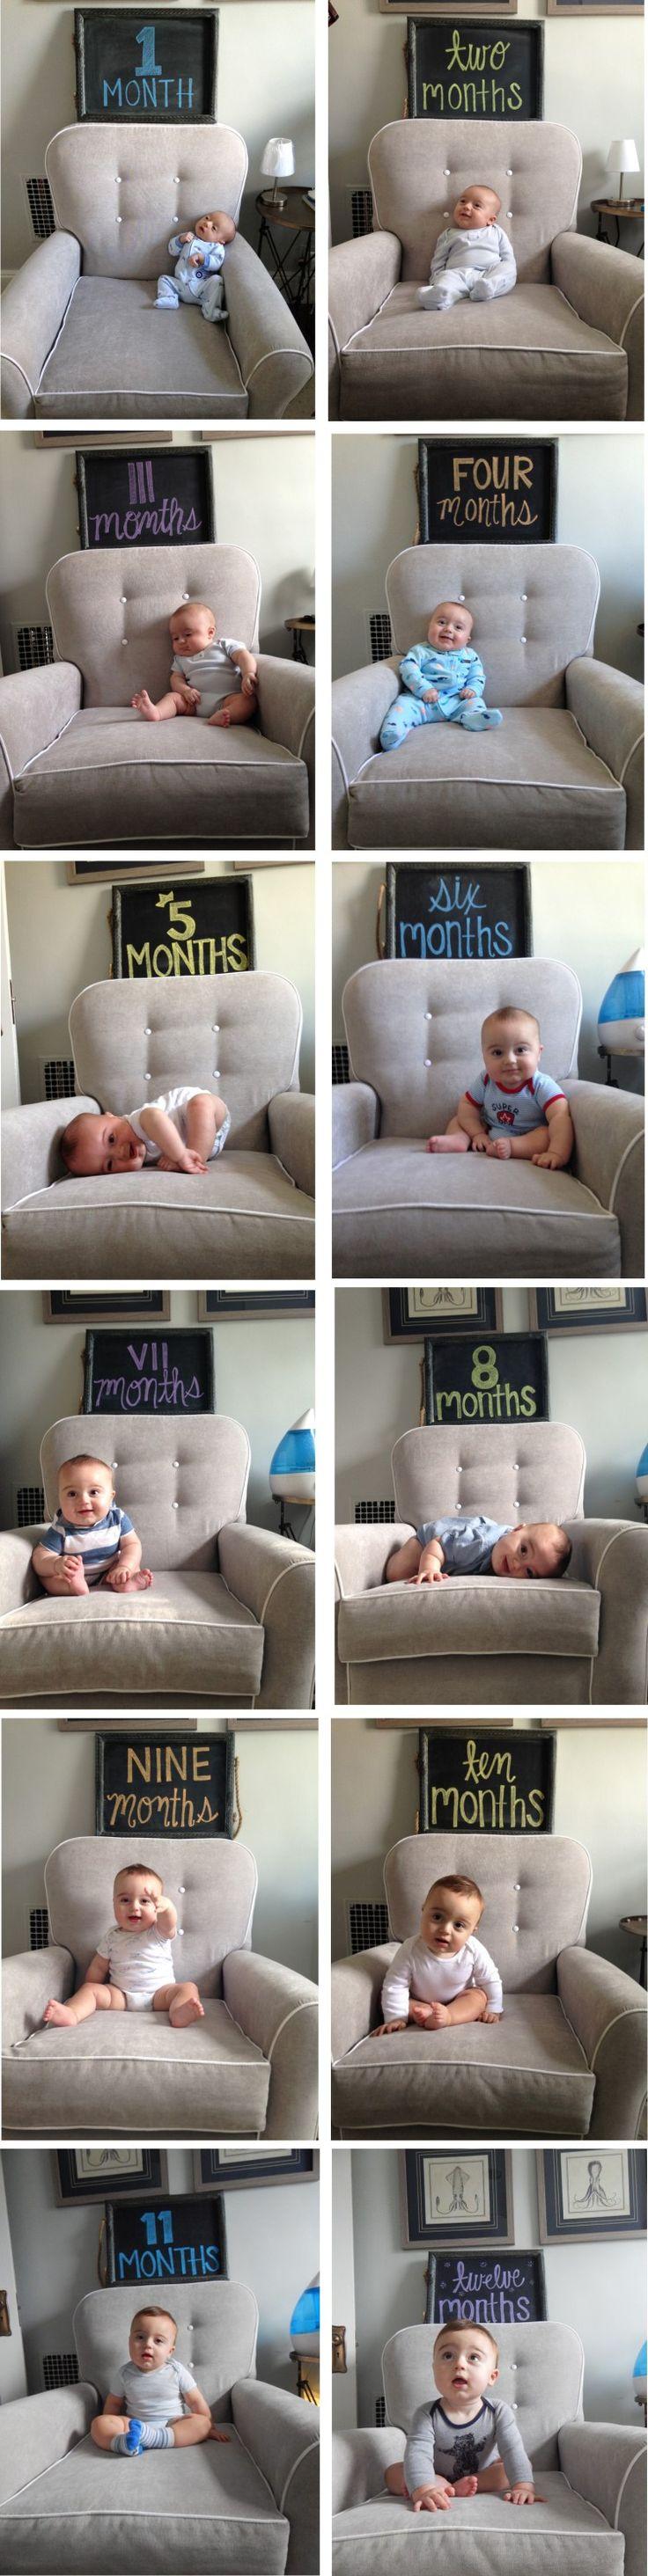 Baby chalkboard monthly milestone marker {a little diy}